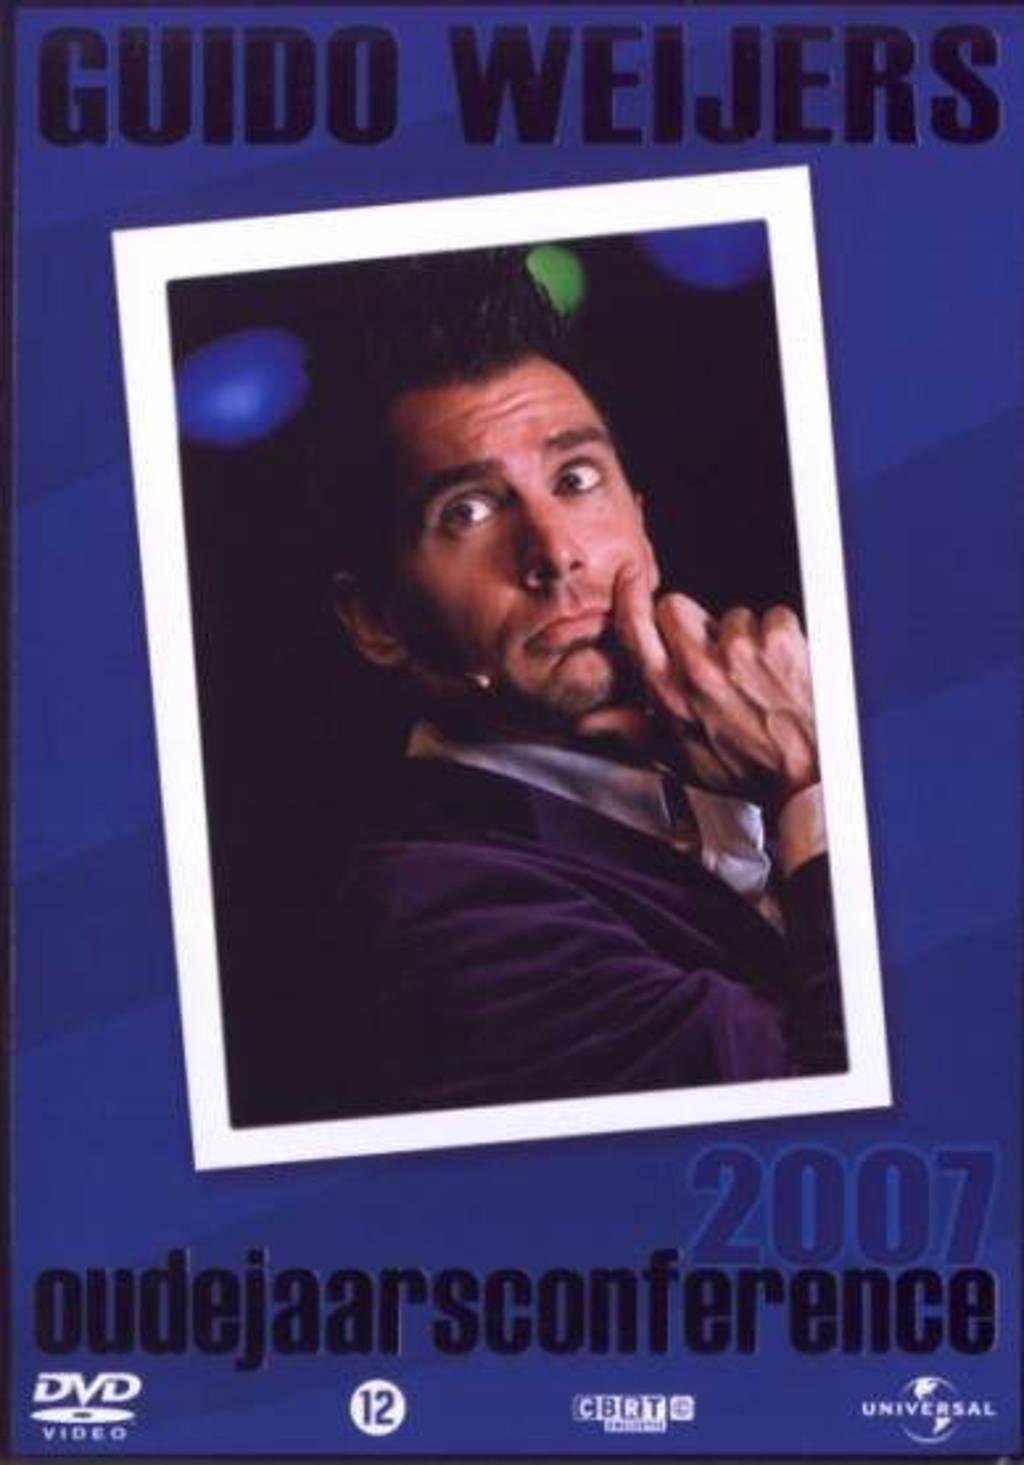 Guido Weijers-oudejaarsconference 2007 (DVD)